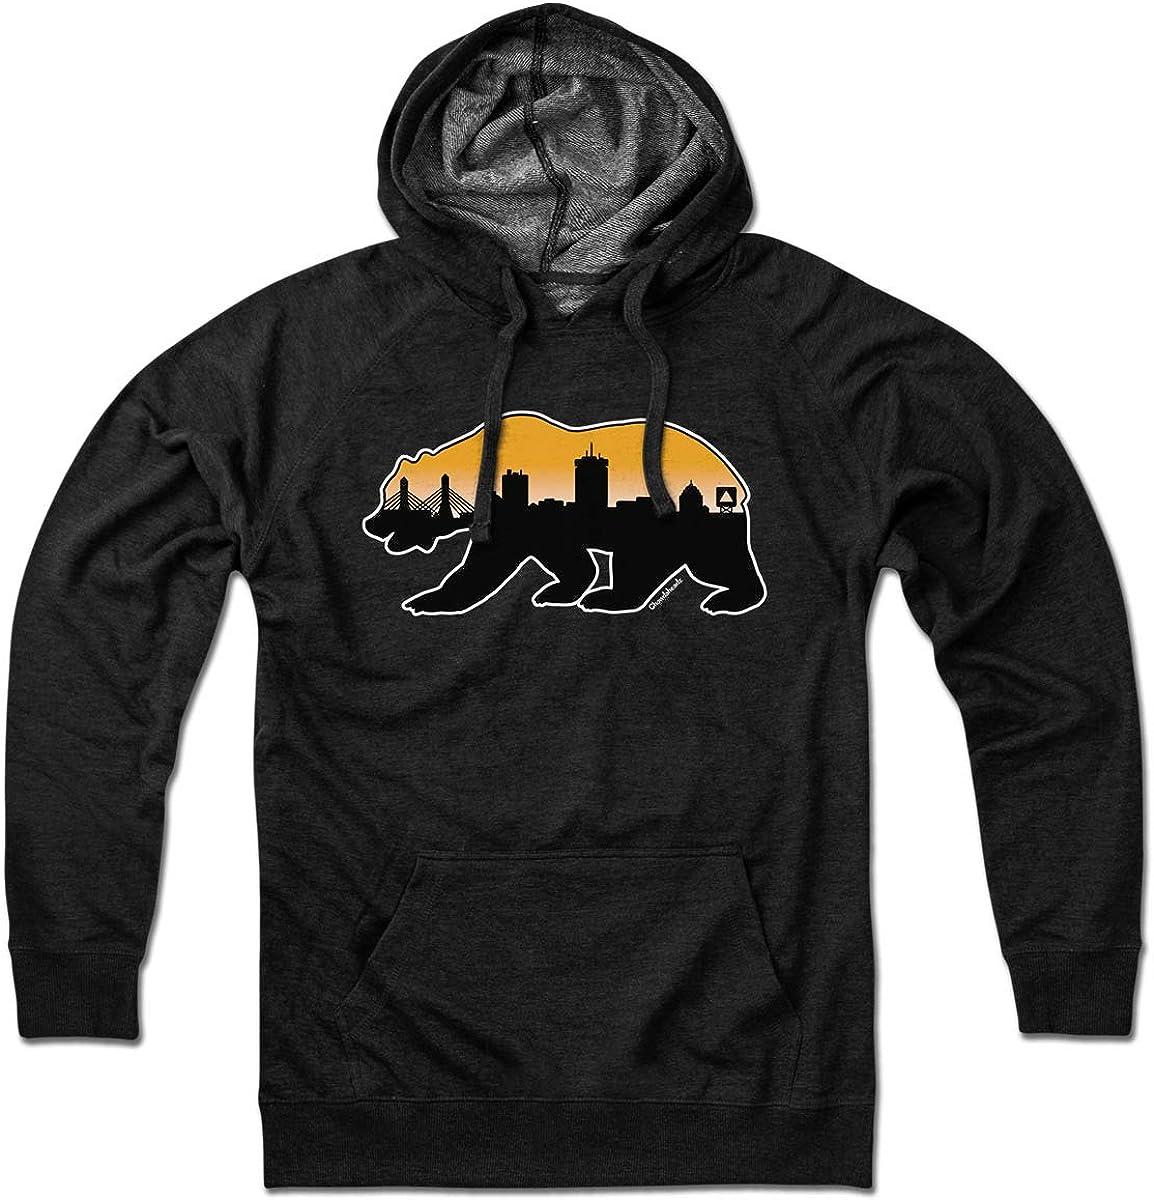 Rare Boston Bear Hoodie Skyline Excellence